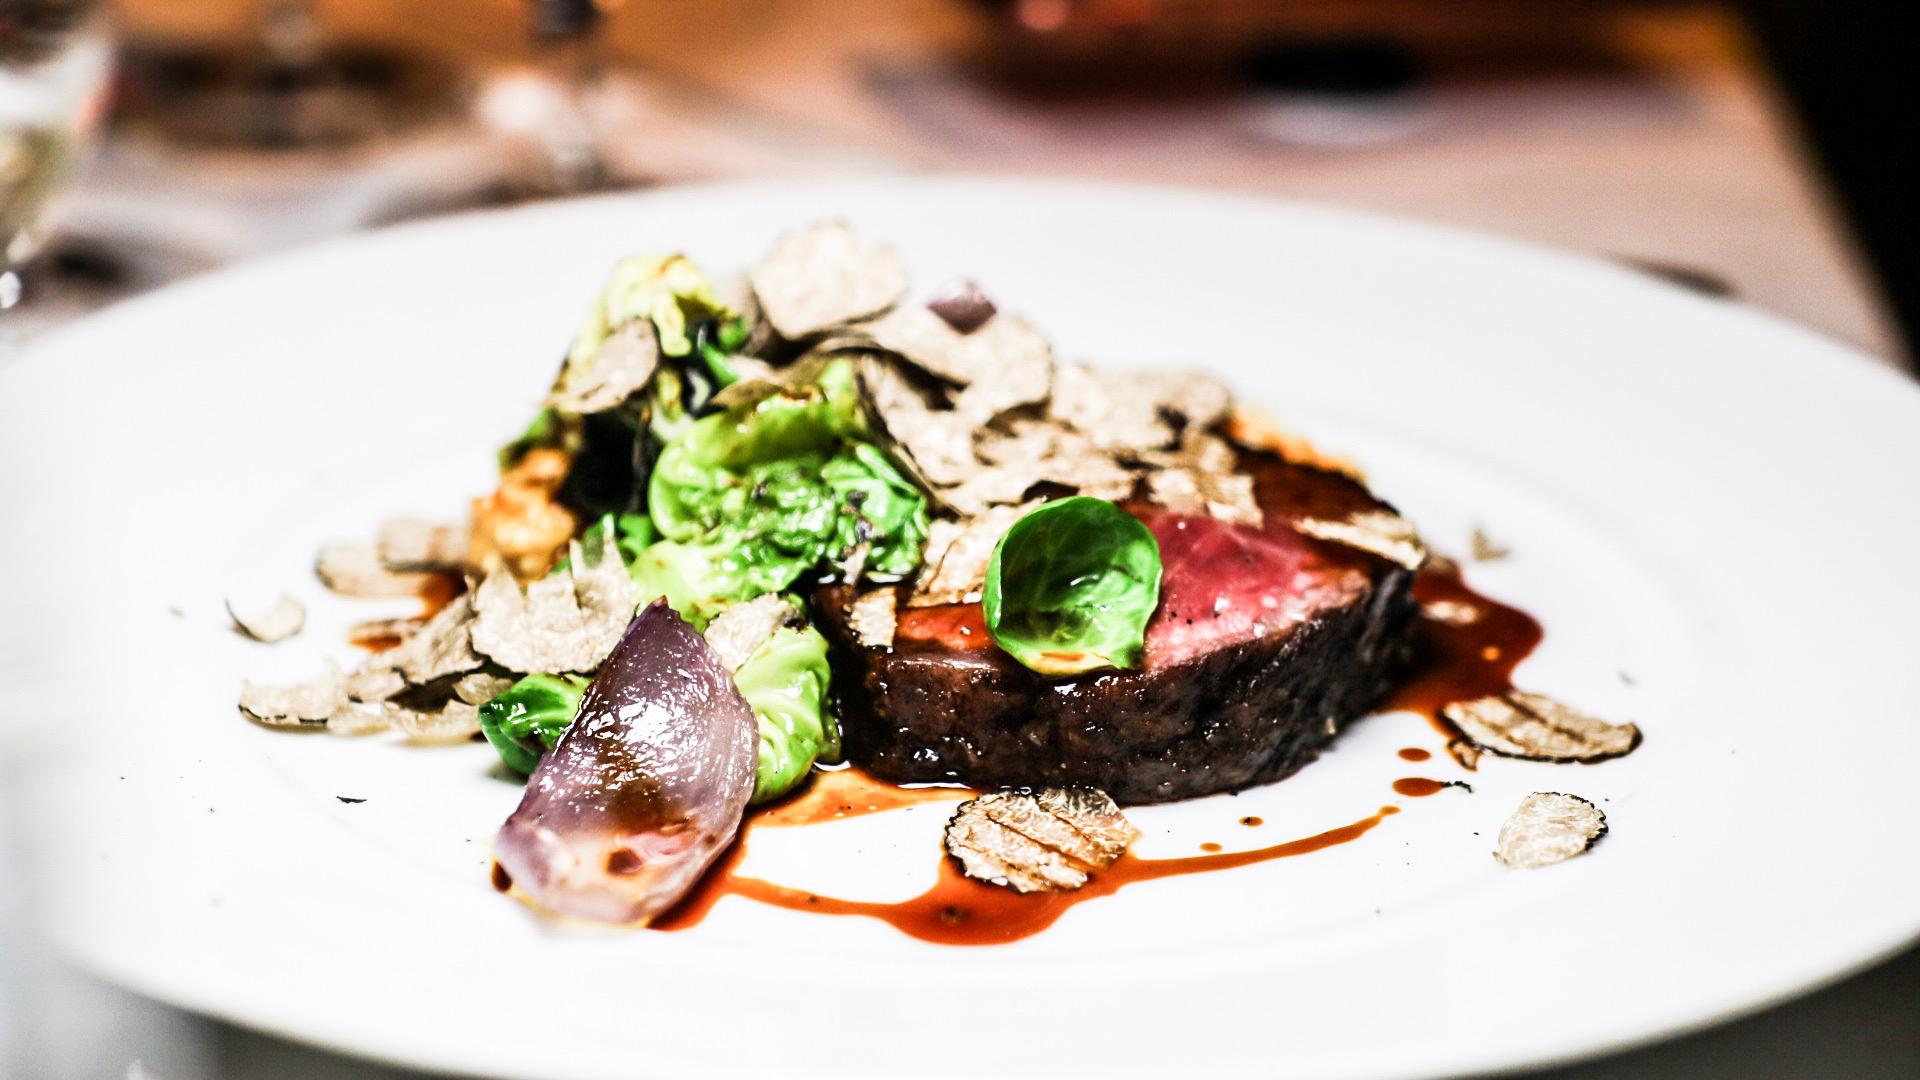 Wood-Grilled Snake River Farm Wagyu Steak